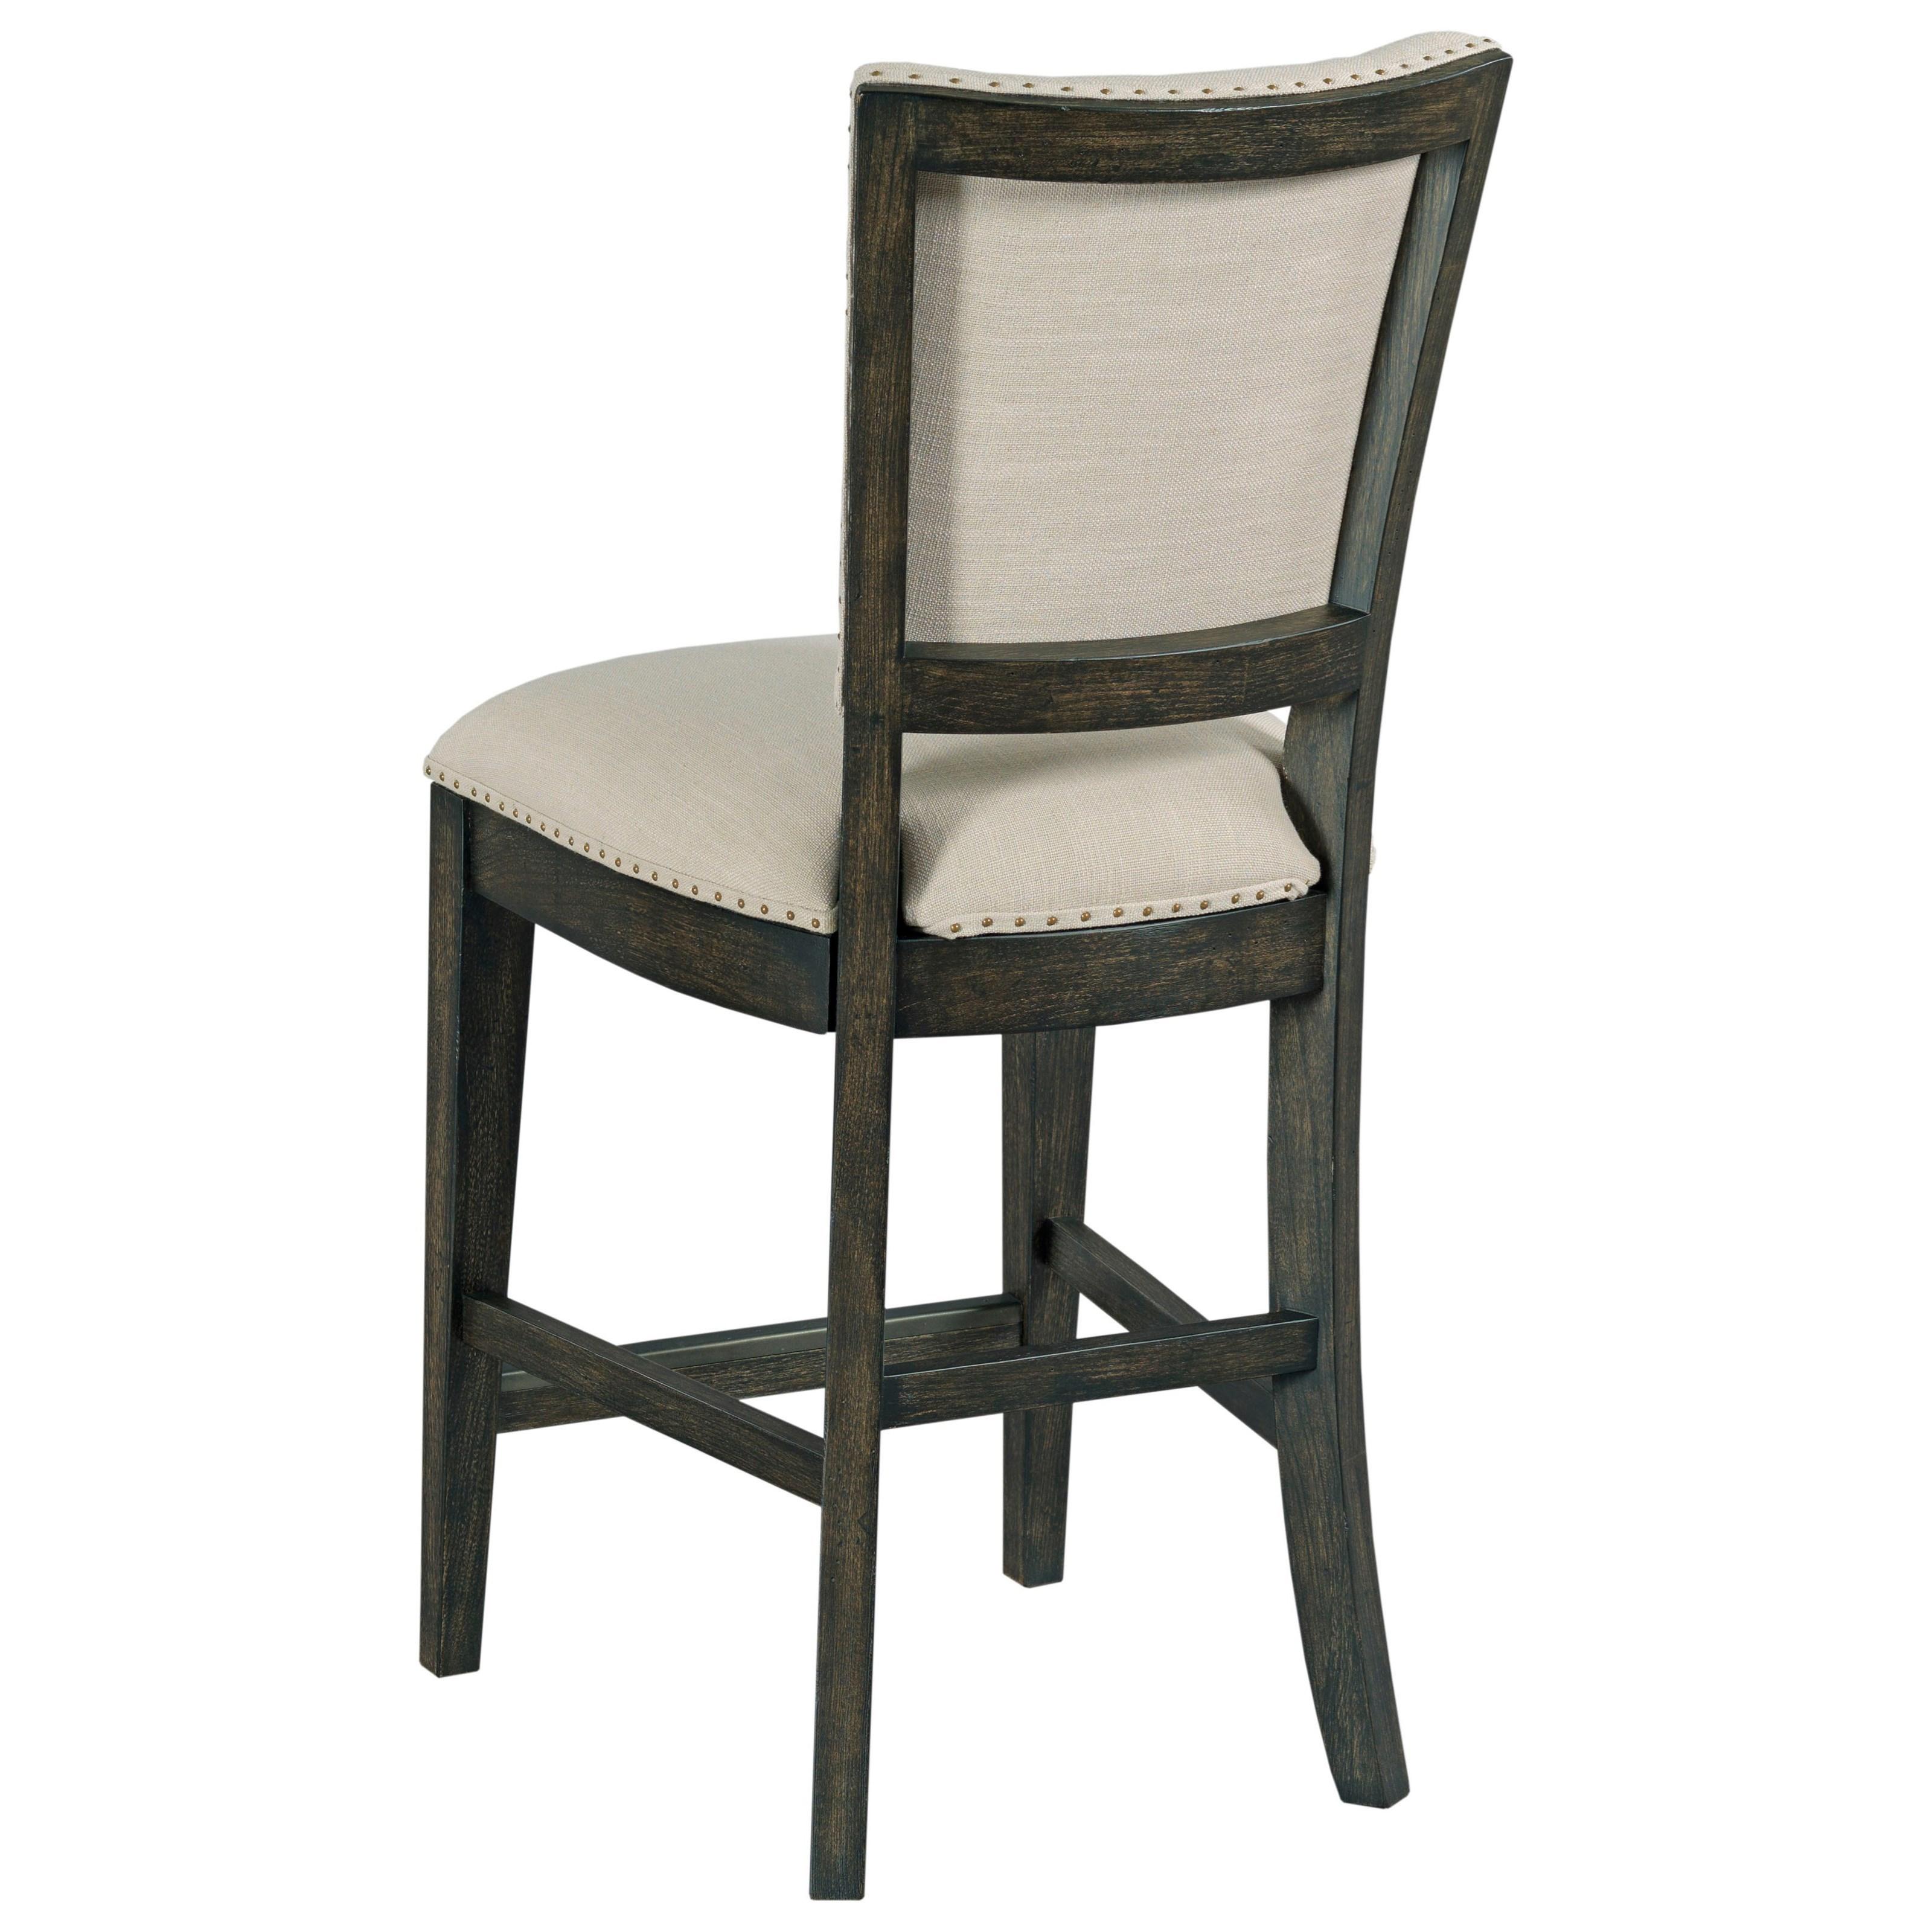 Kincaid furniture plank road c kimler upholstered